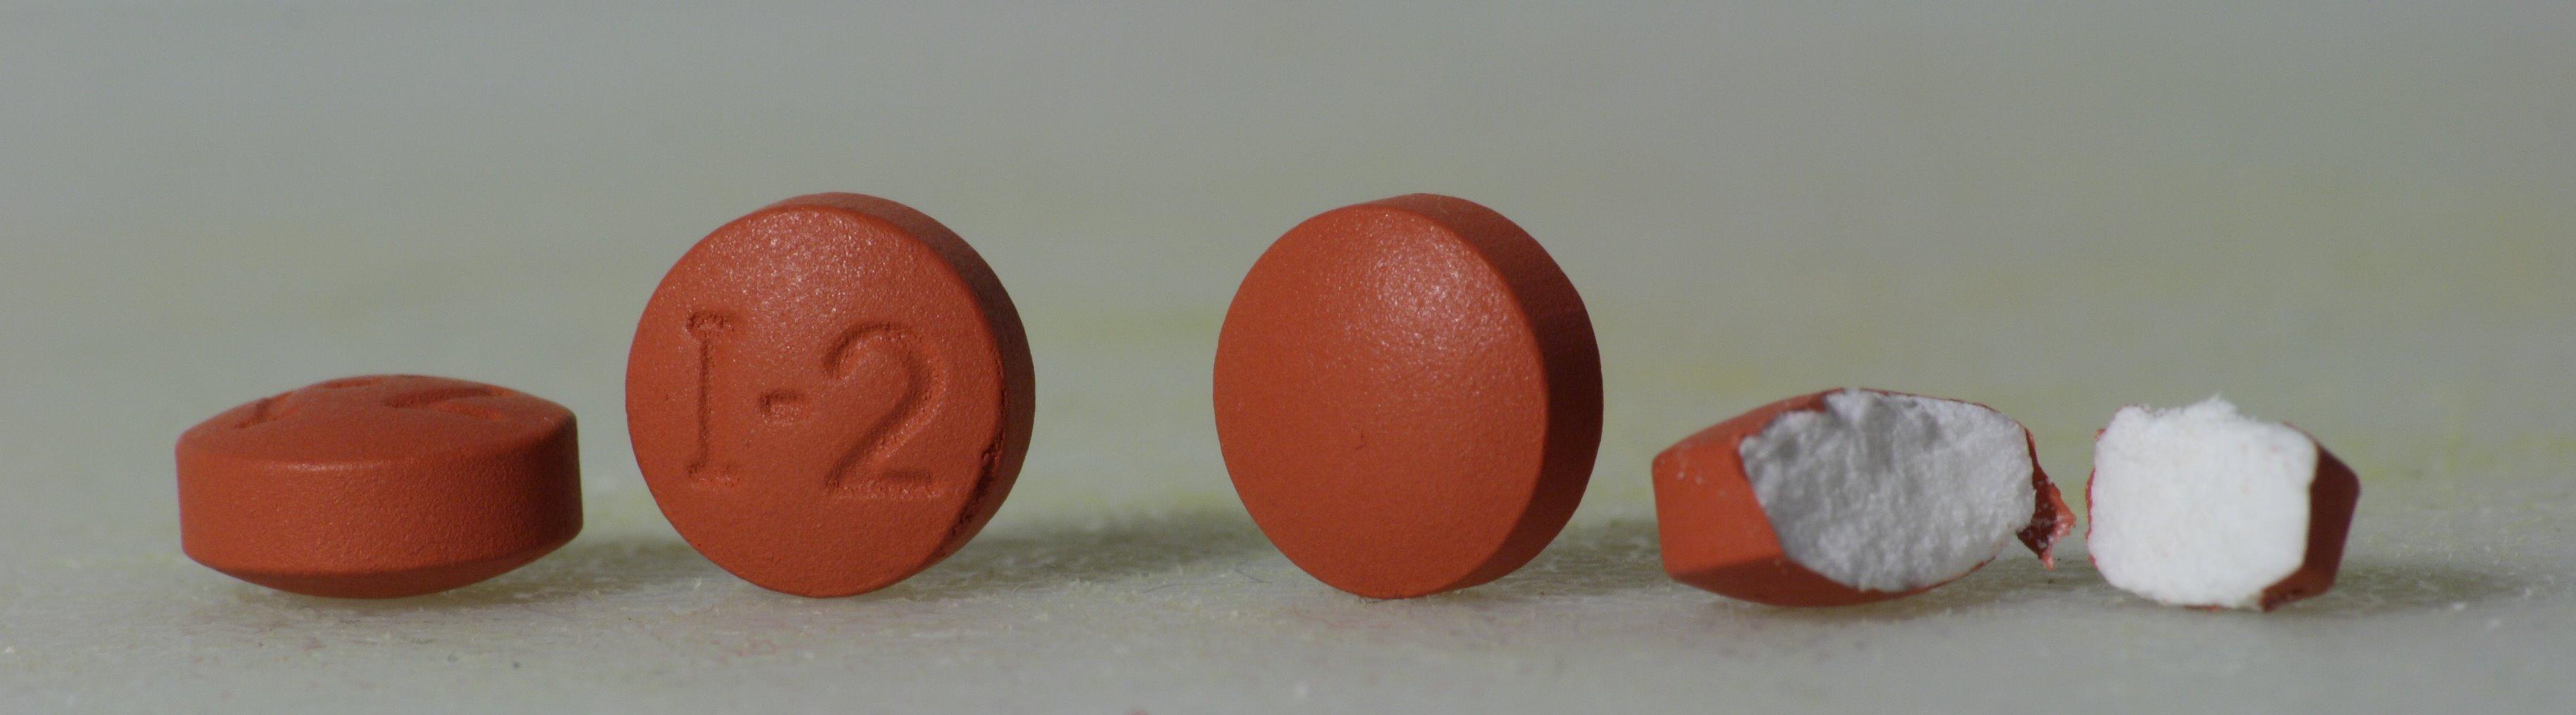 ibuprofen antipyretic mechanism of action